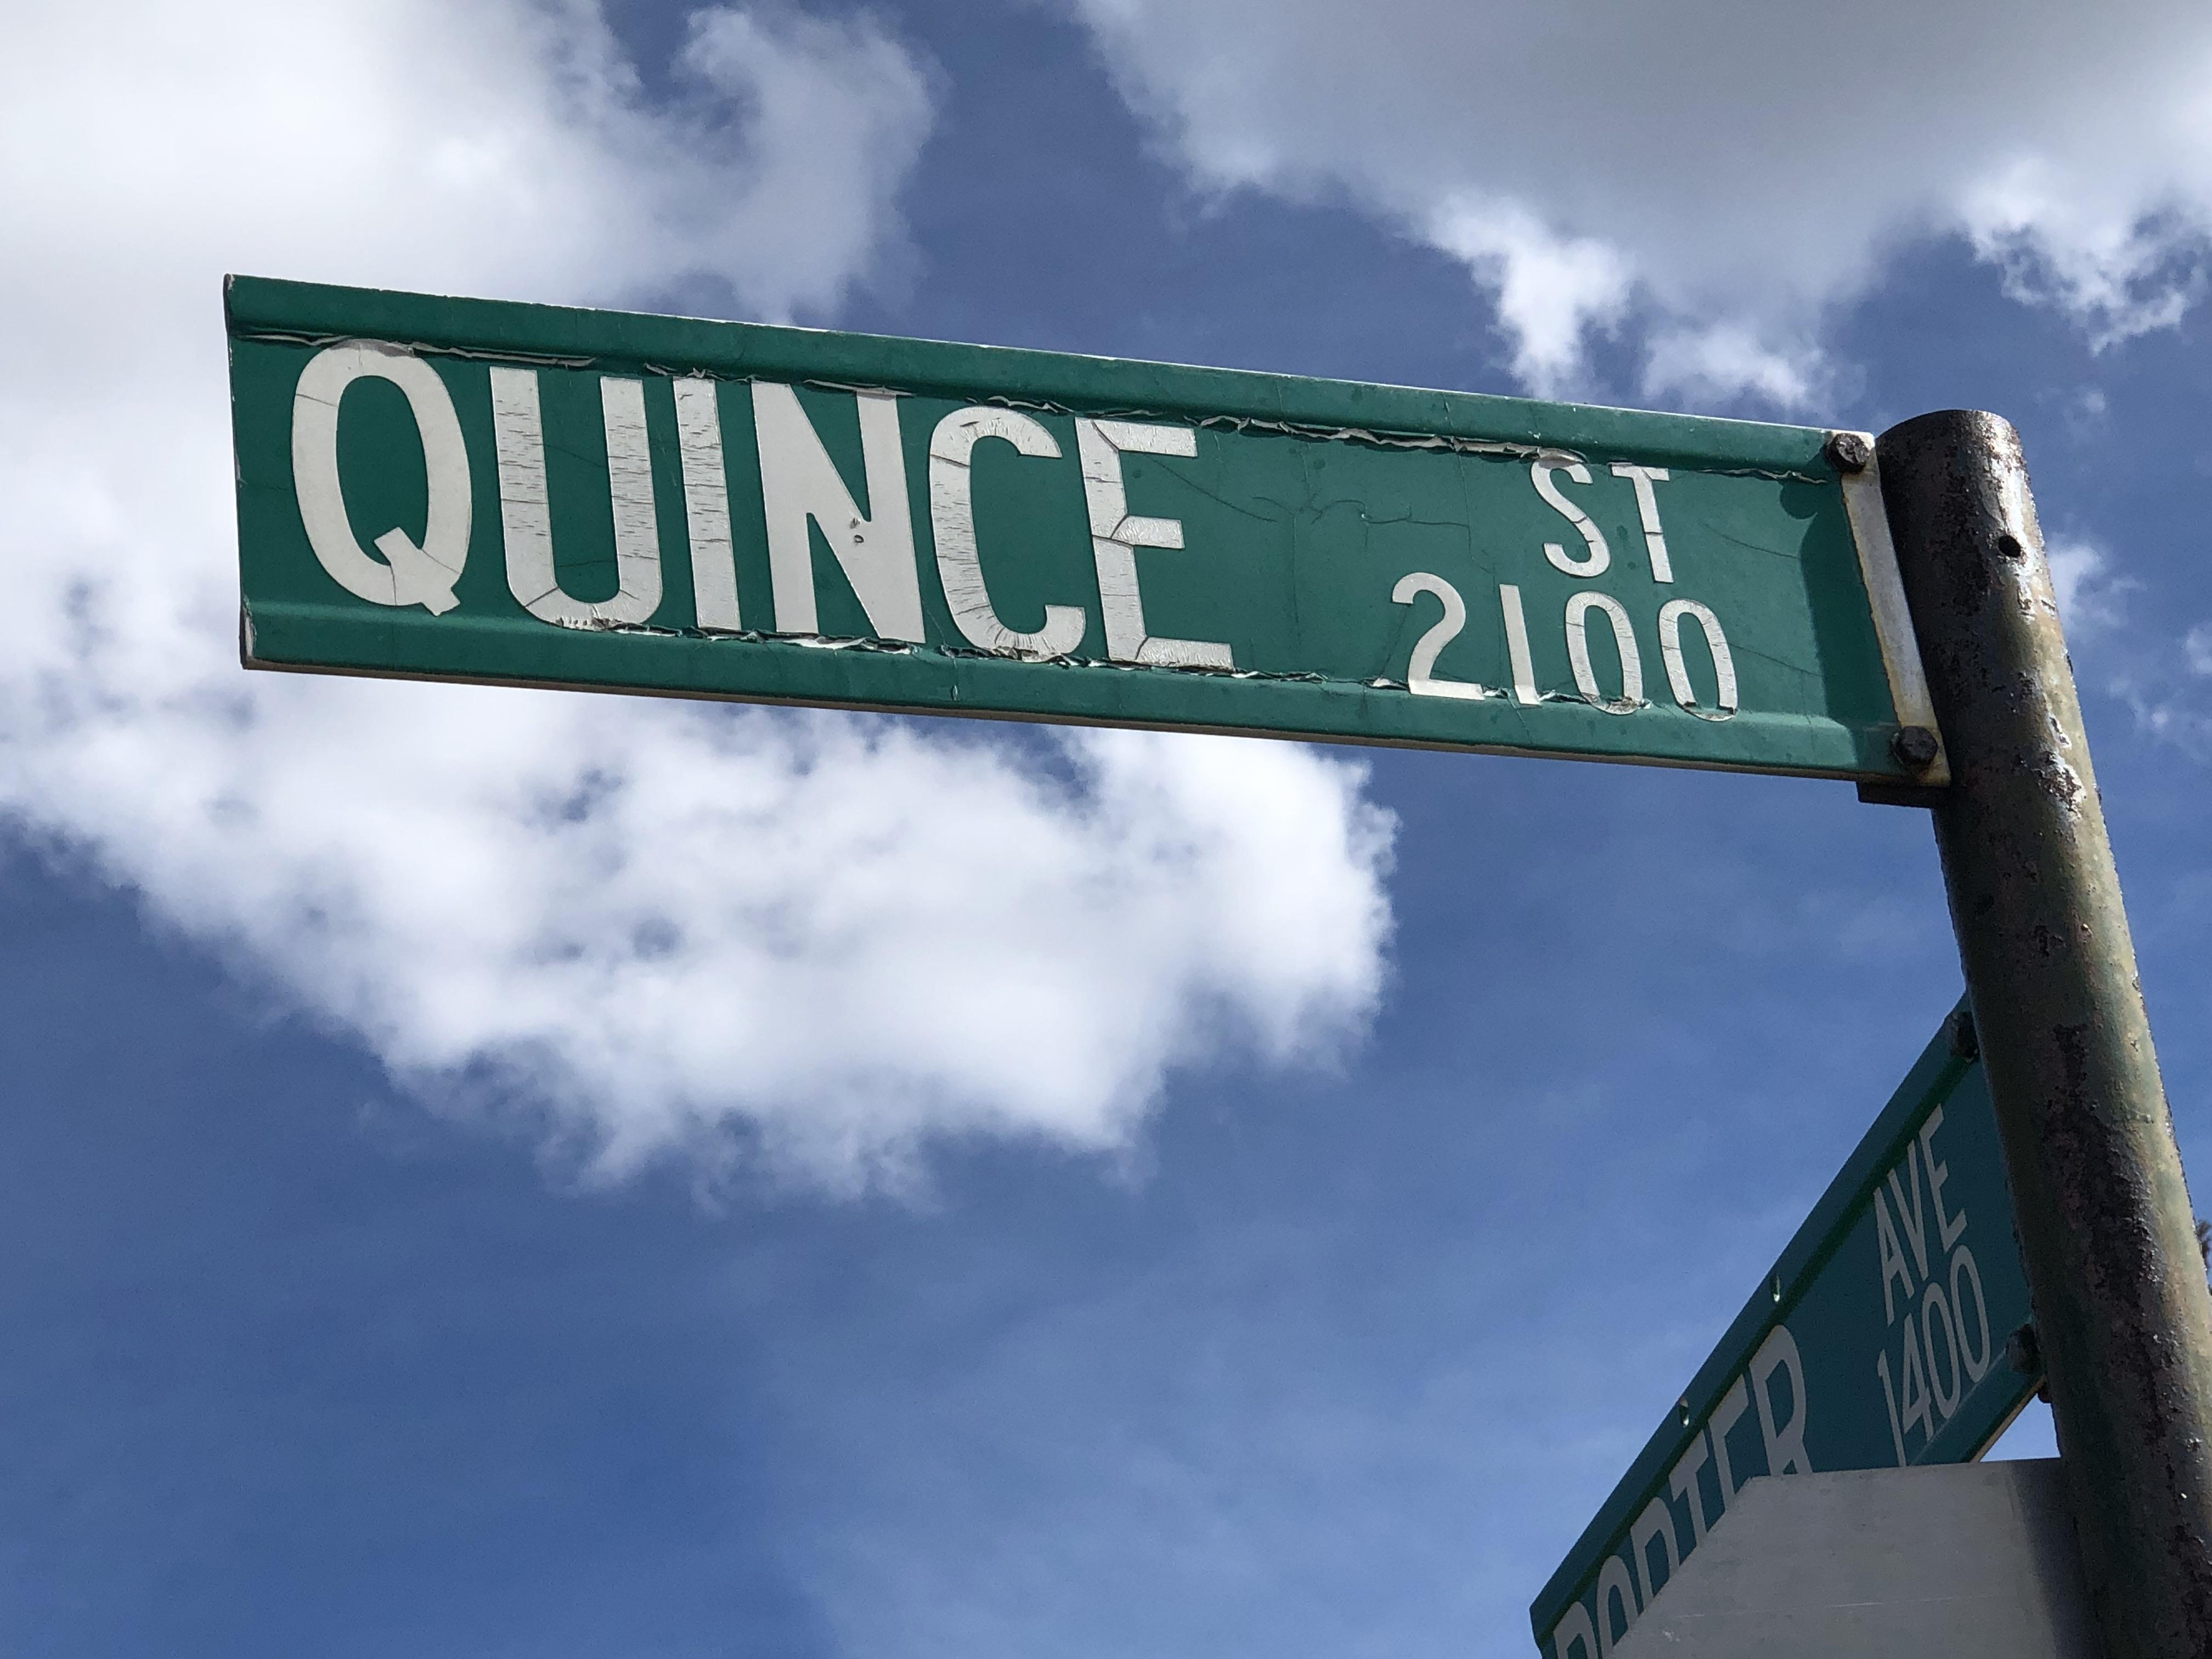 Arrest warrants issued following Quince Street shooting; two in custody